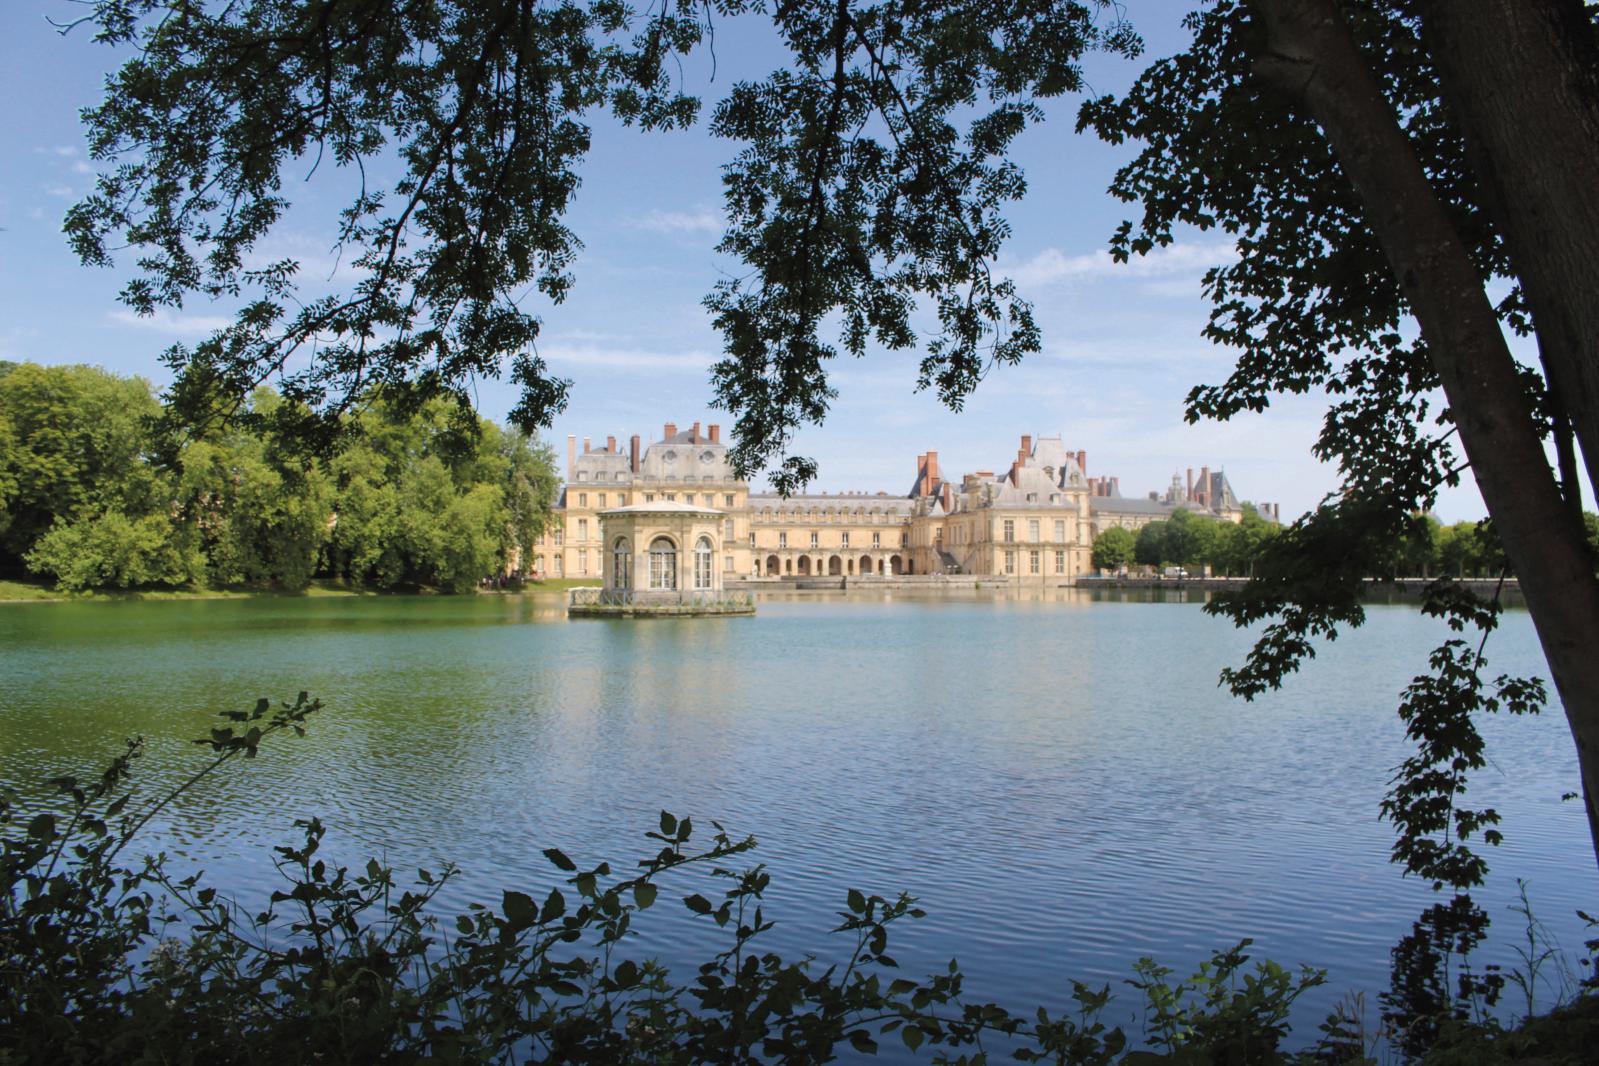 Palace of Fontainebleau@ MATHILDE HEROUET